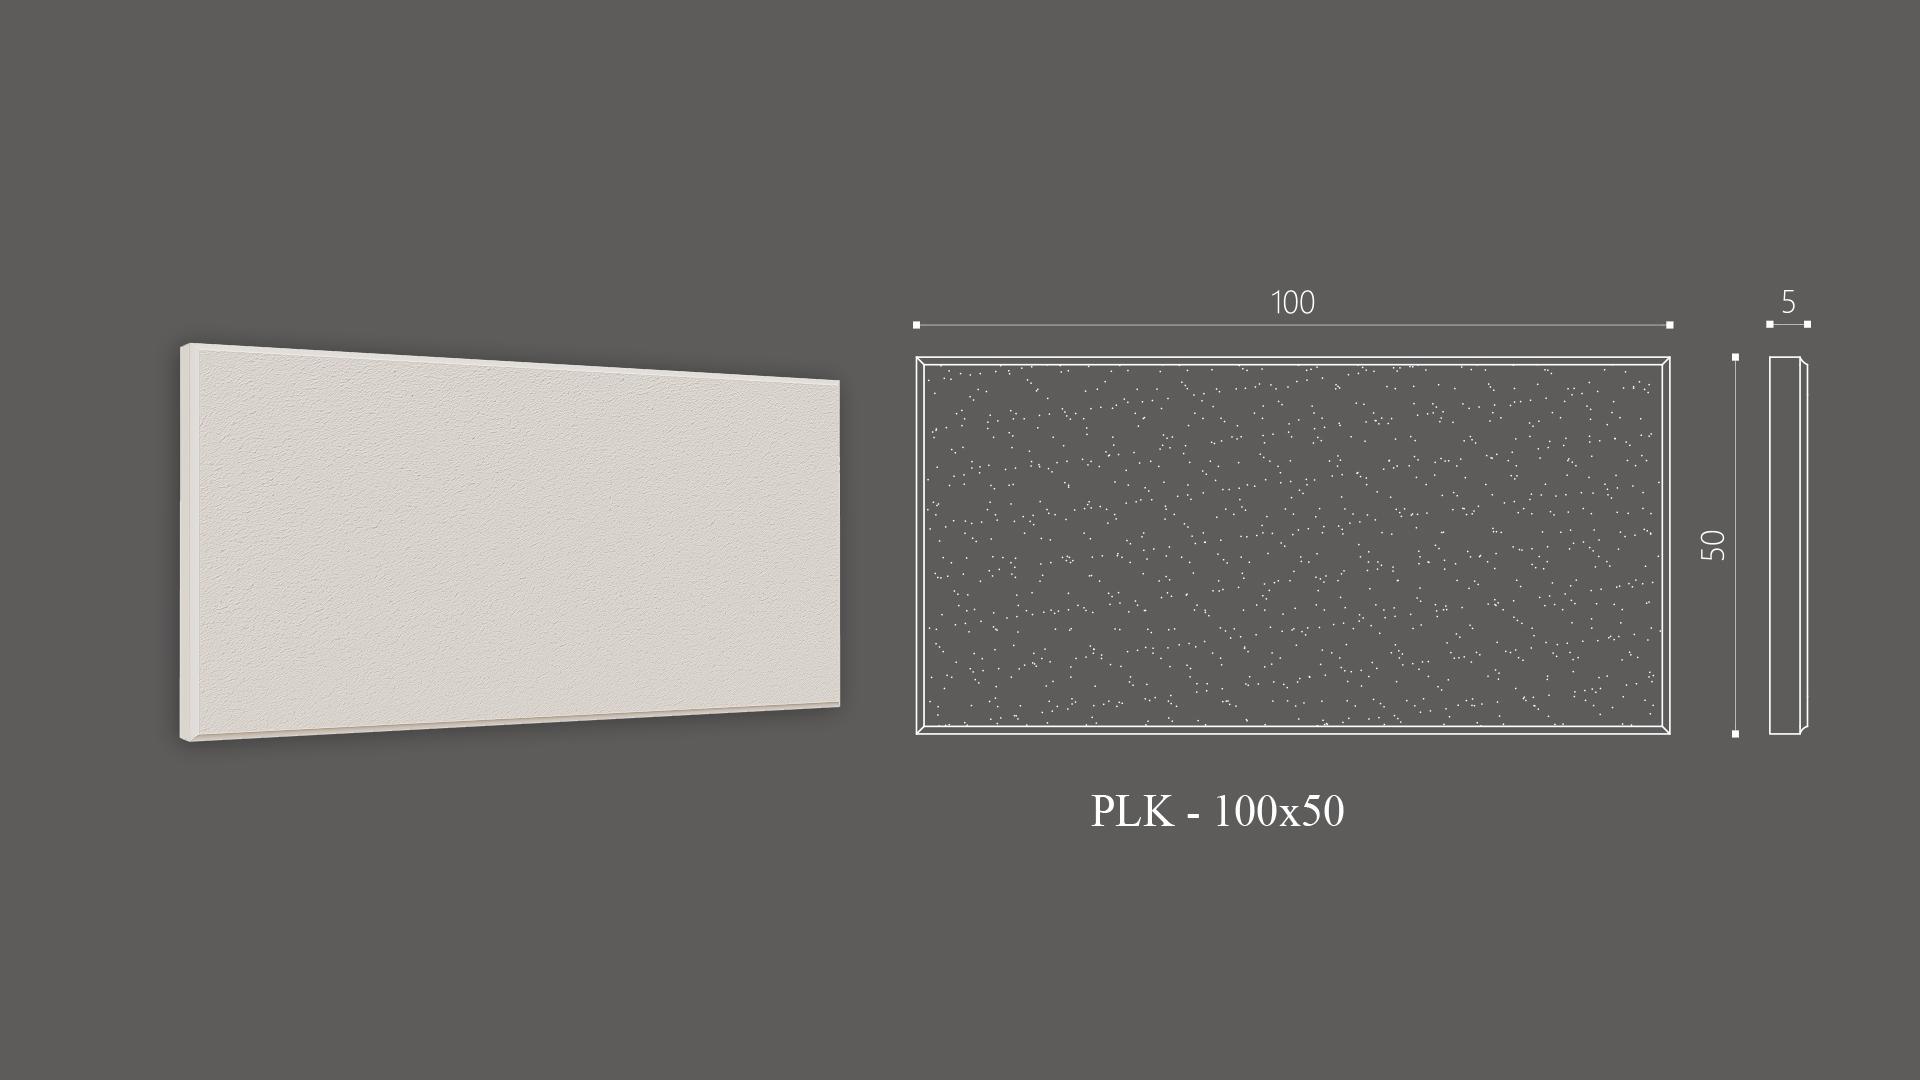 PLK – 100×50